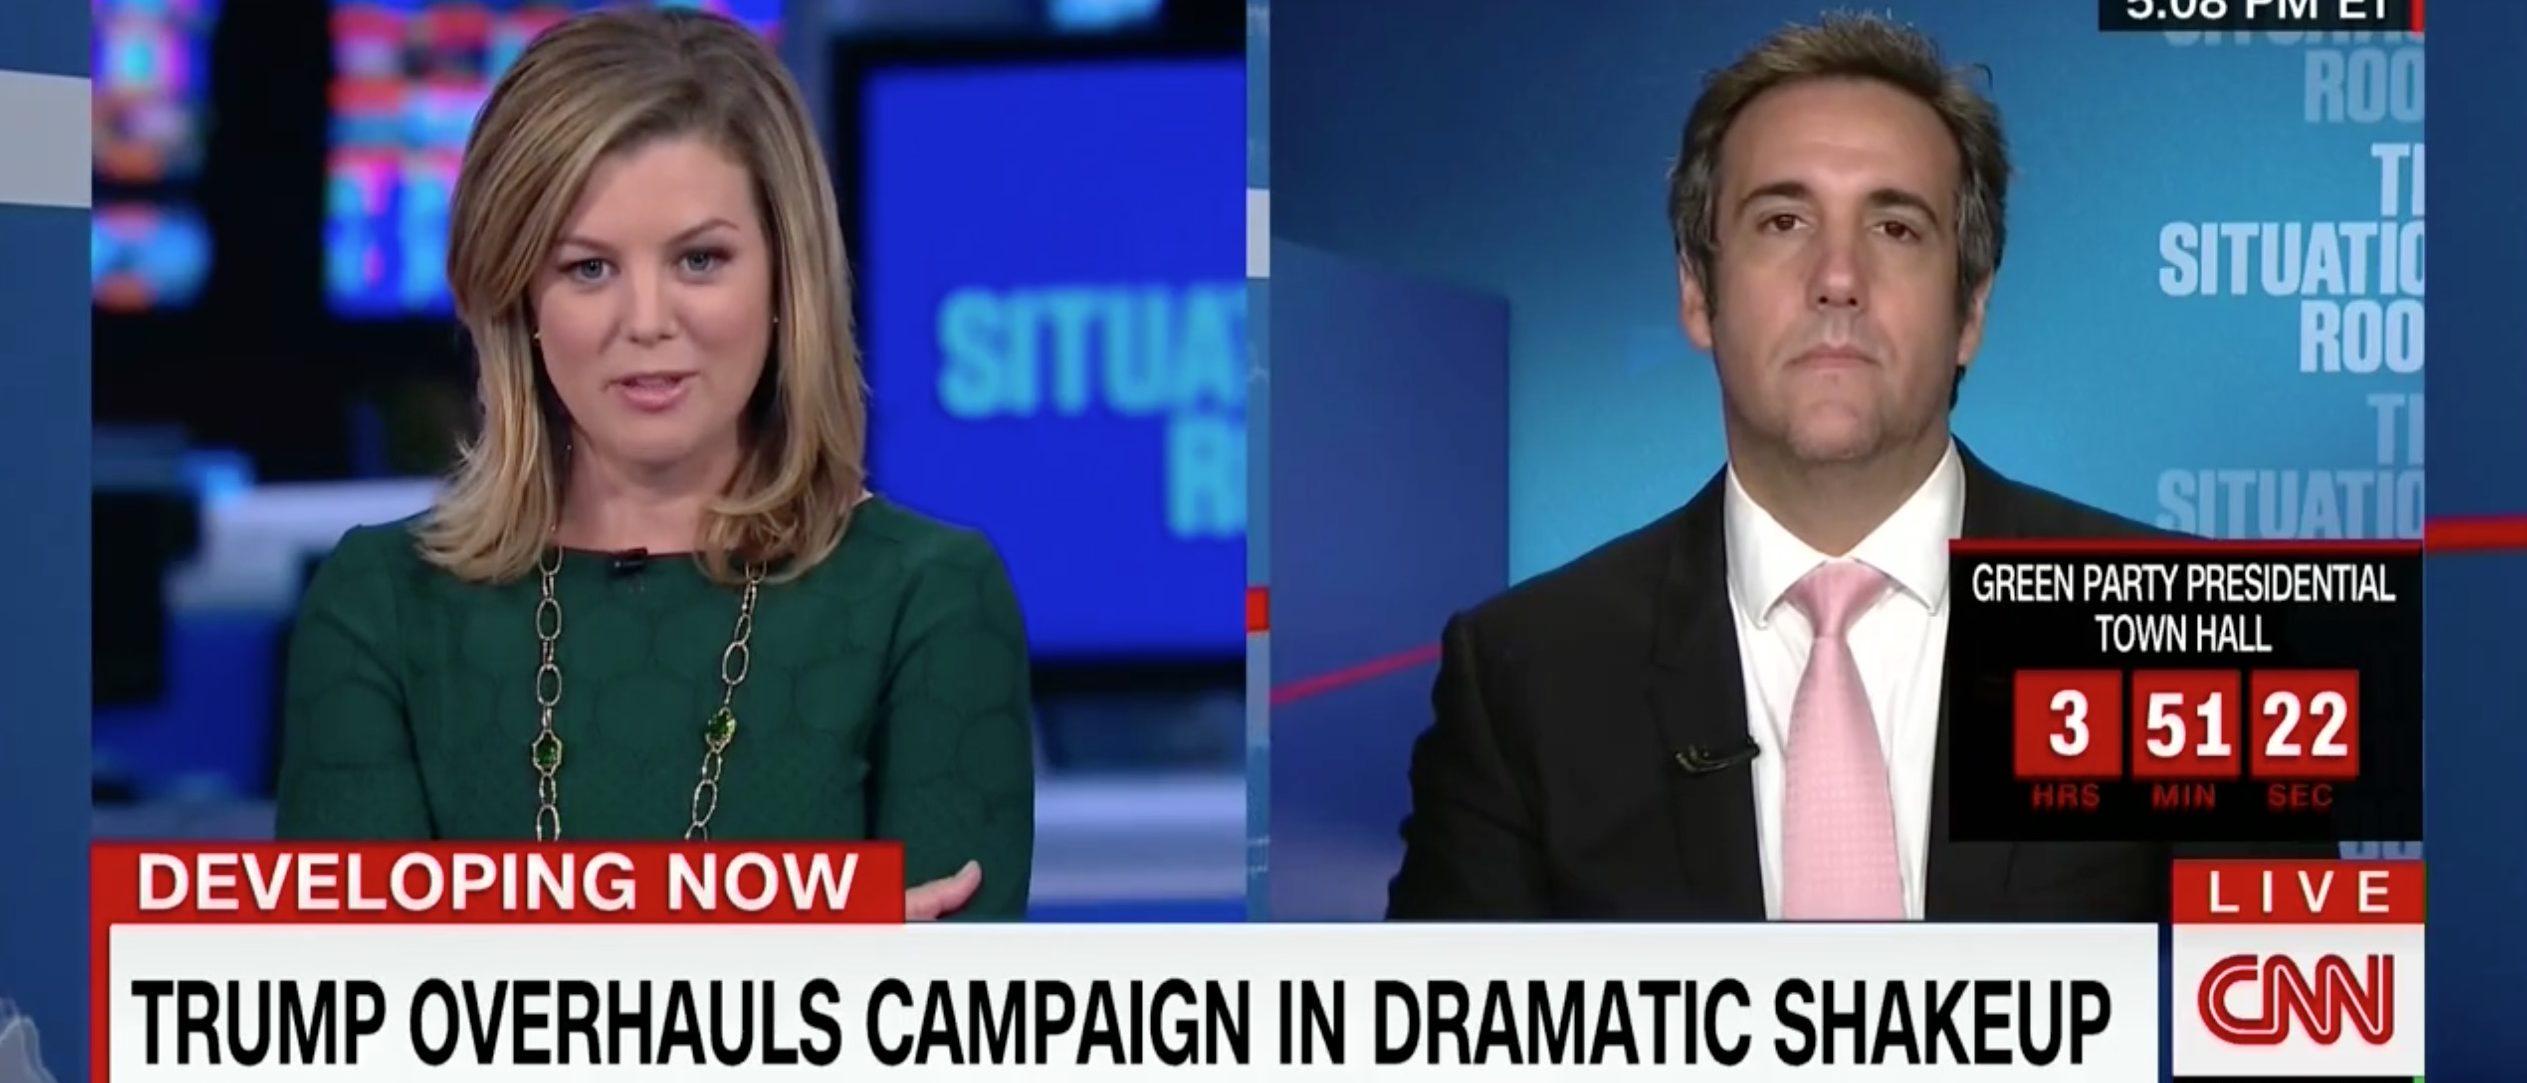 Michael Cohen, Screen Grab CNN, 8-17-2016